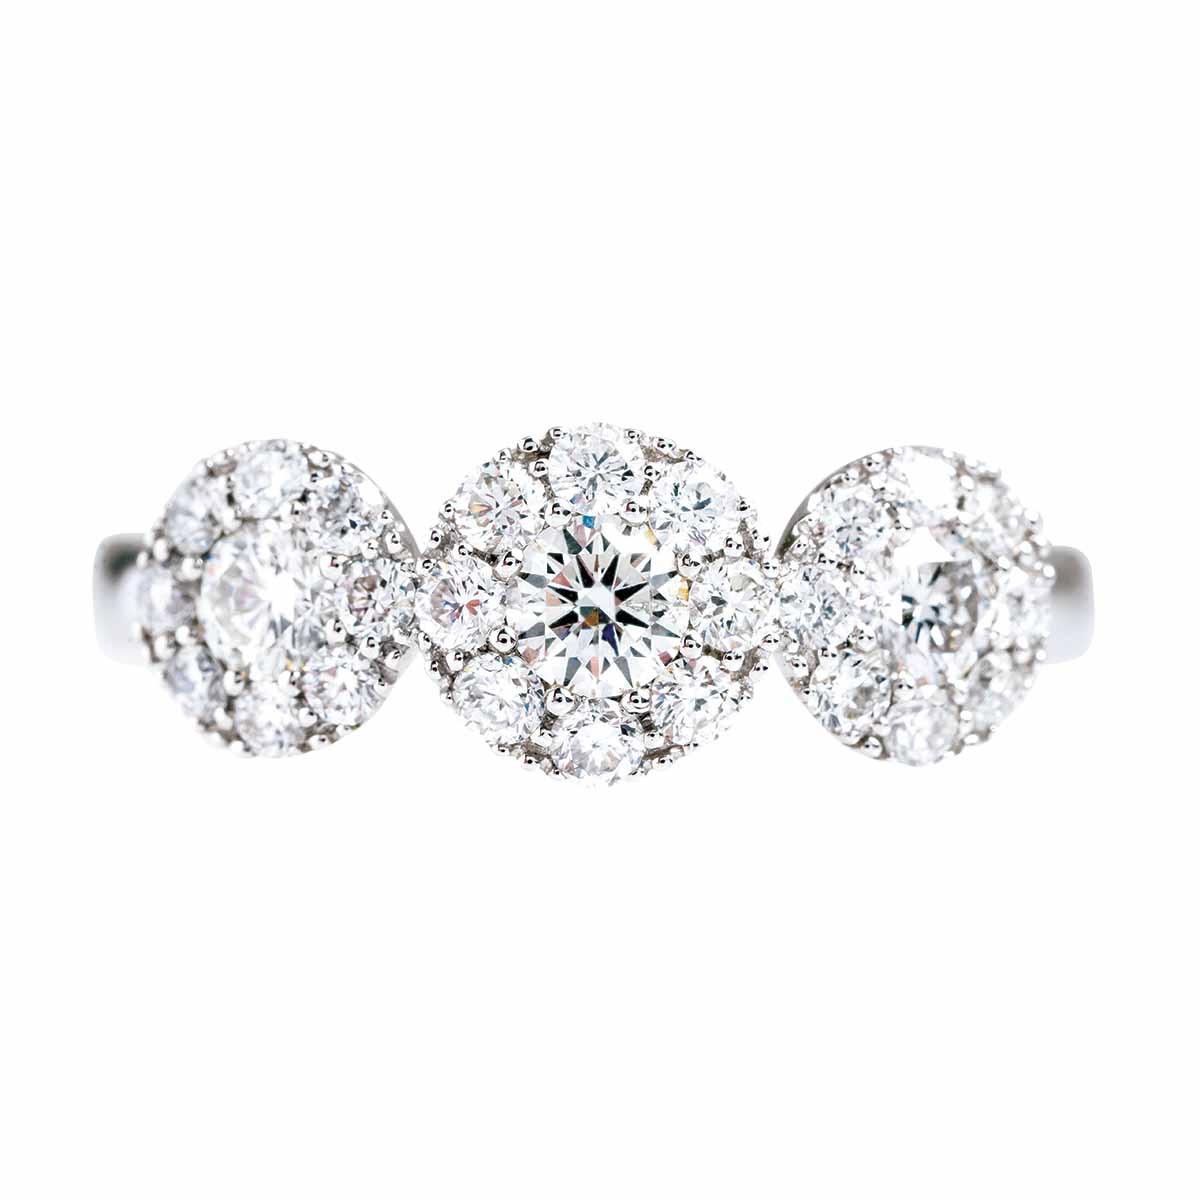 New 0.89 CTW Diamond Halo Ring